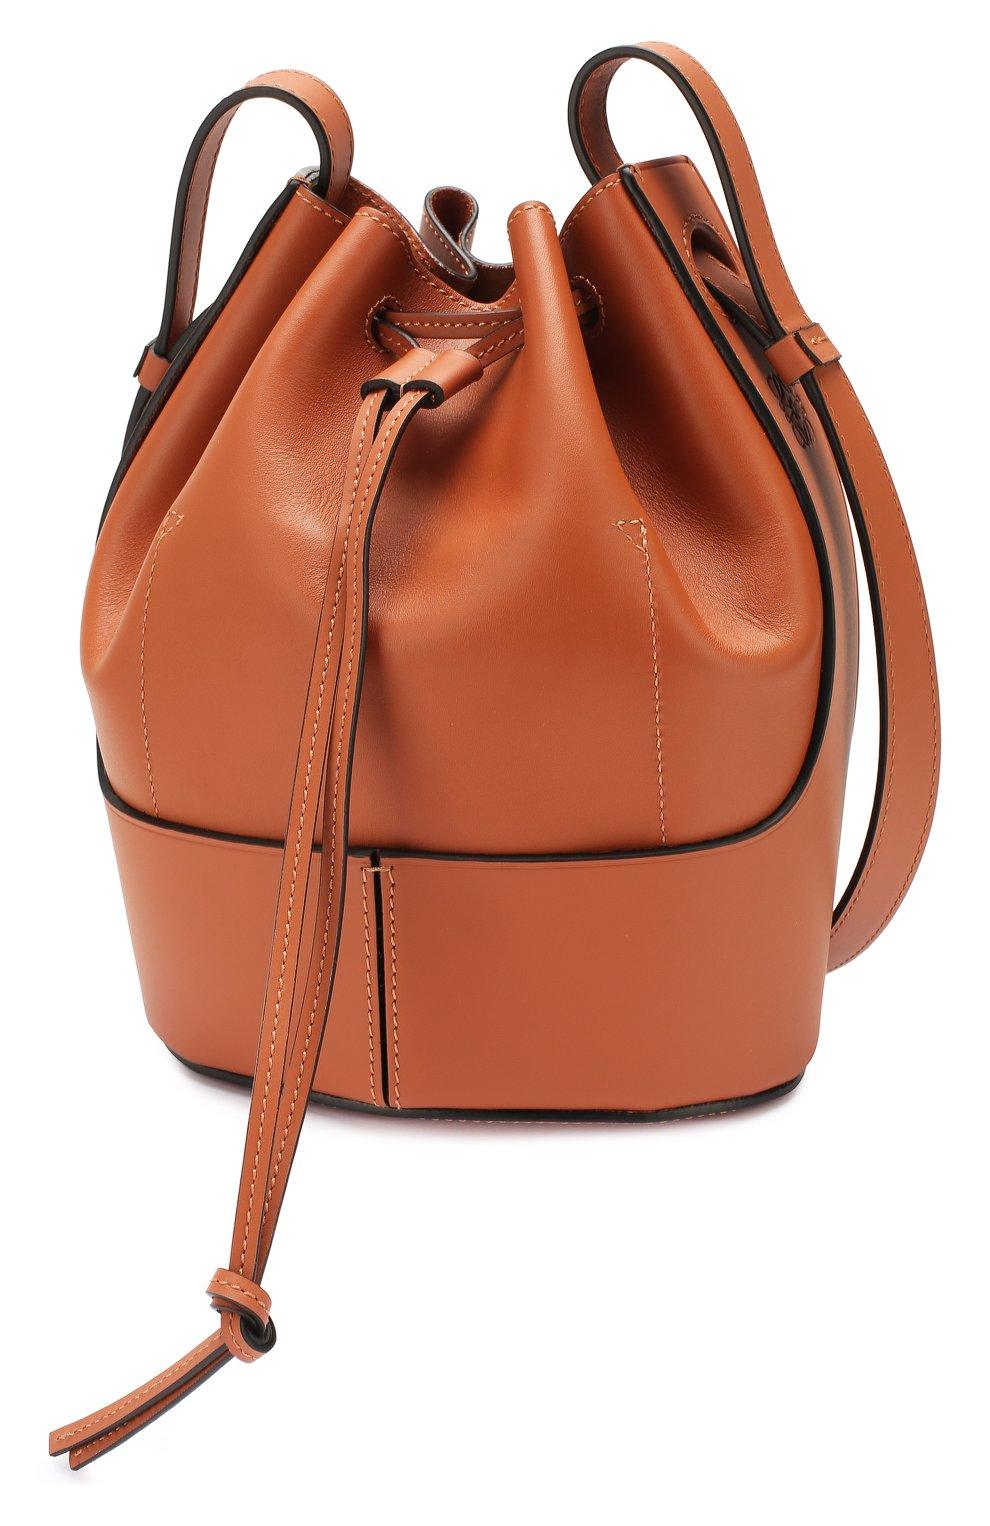 Женская сумка balloon small LOEWE светло-коричневого цвета, арт. 326.75AC31   Фото 3 (Сумки-технические: Сумки через плечо; Материал: Натуральная кожа; Ремень/цепочка: На ремешке; Размер: small)